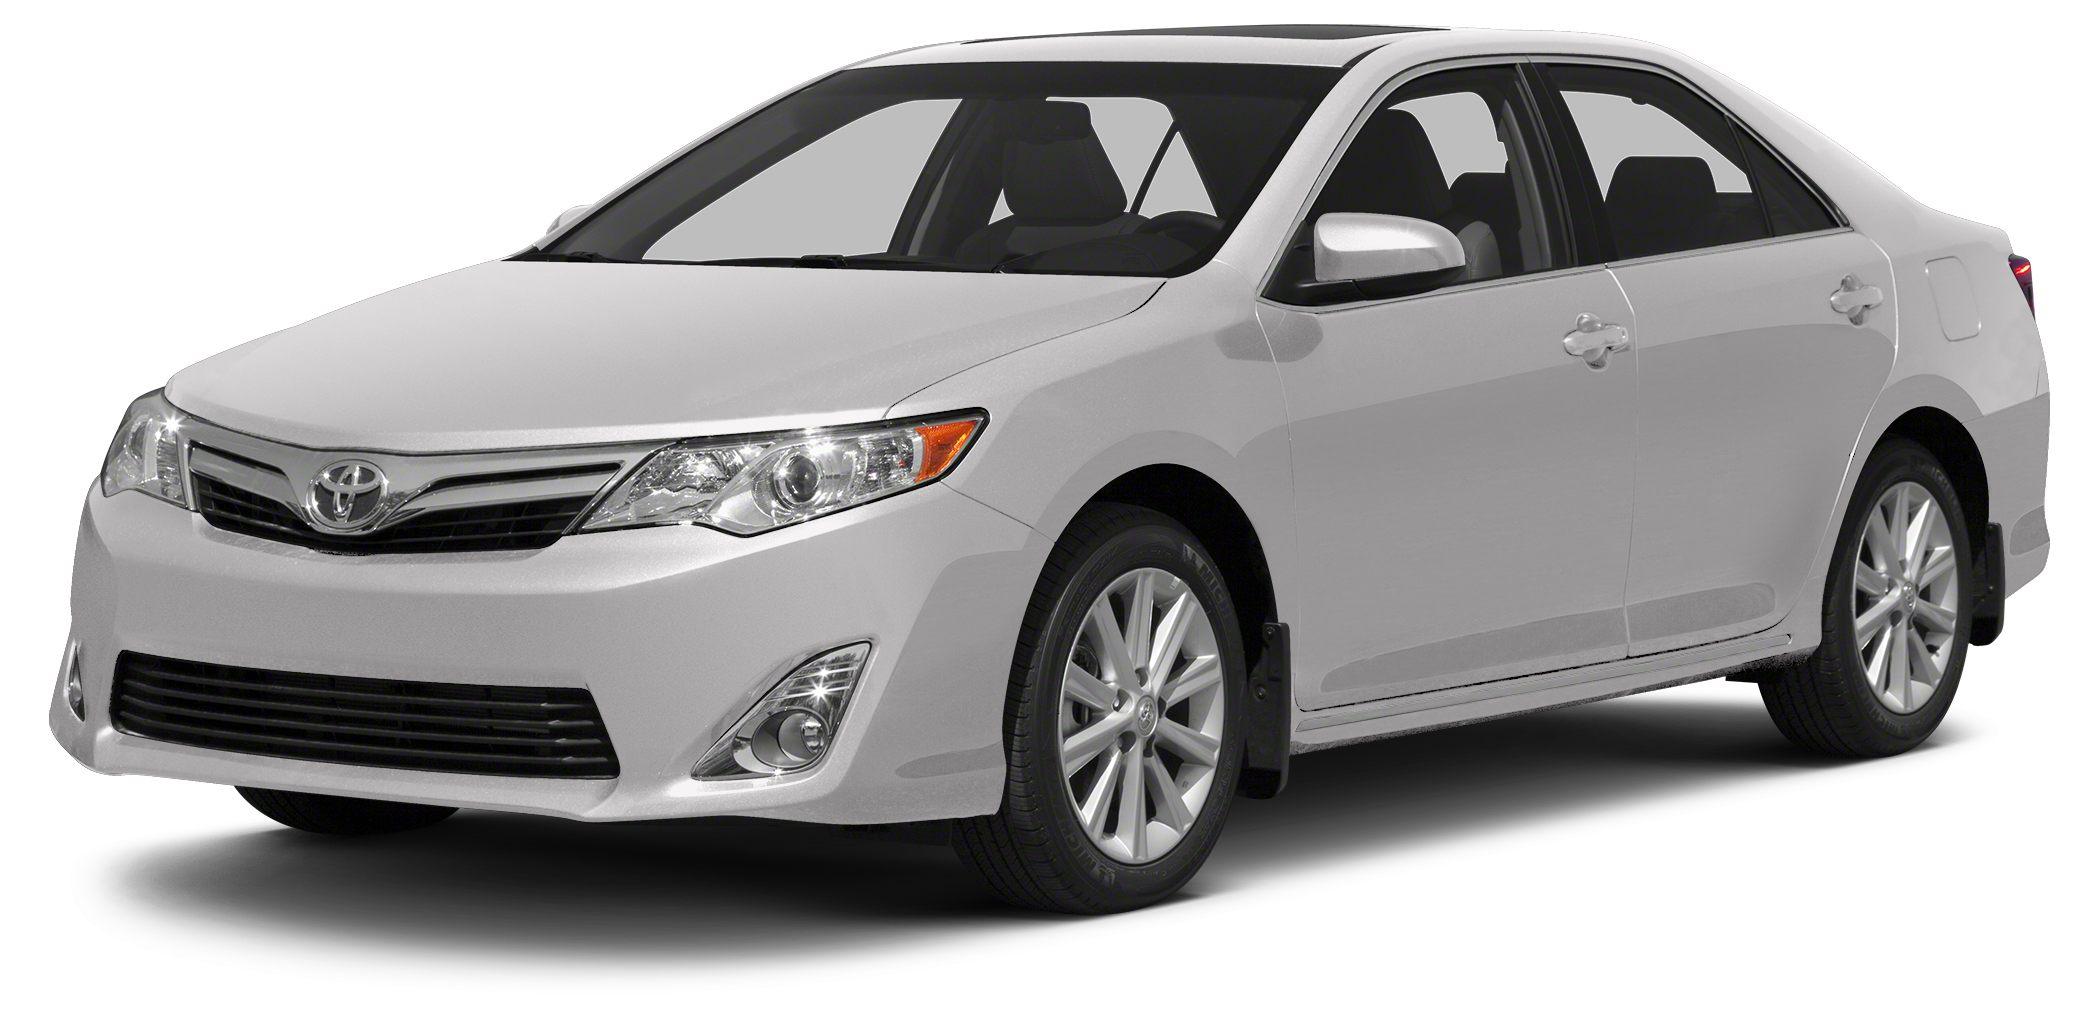 2013 Toyota Camry  Miles 56085Color White Stock 1373 VIN 4T1BF1FK3DU213993